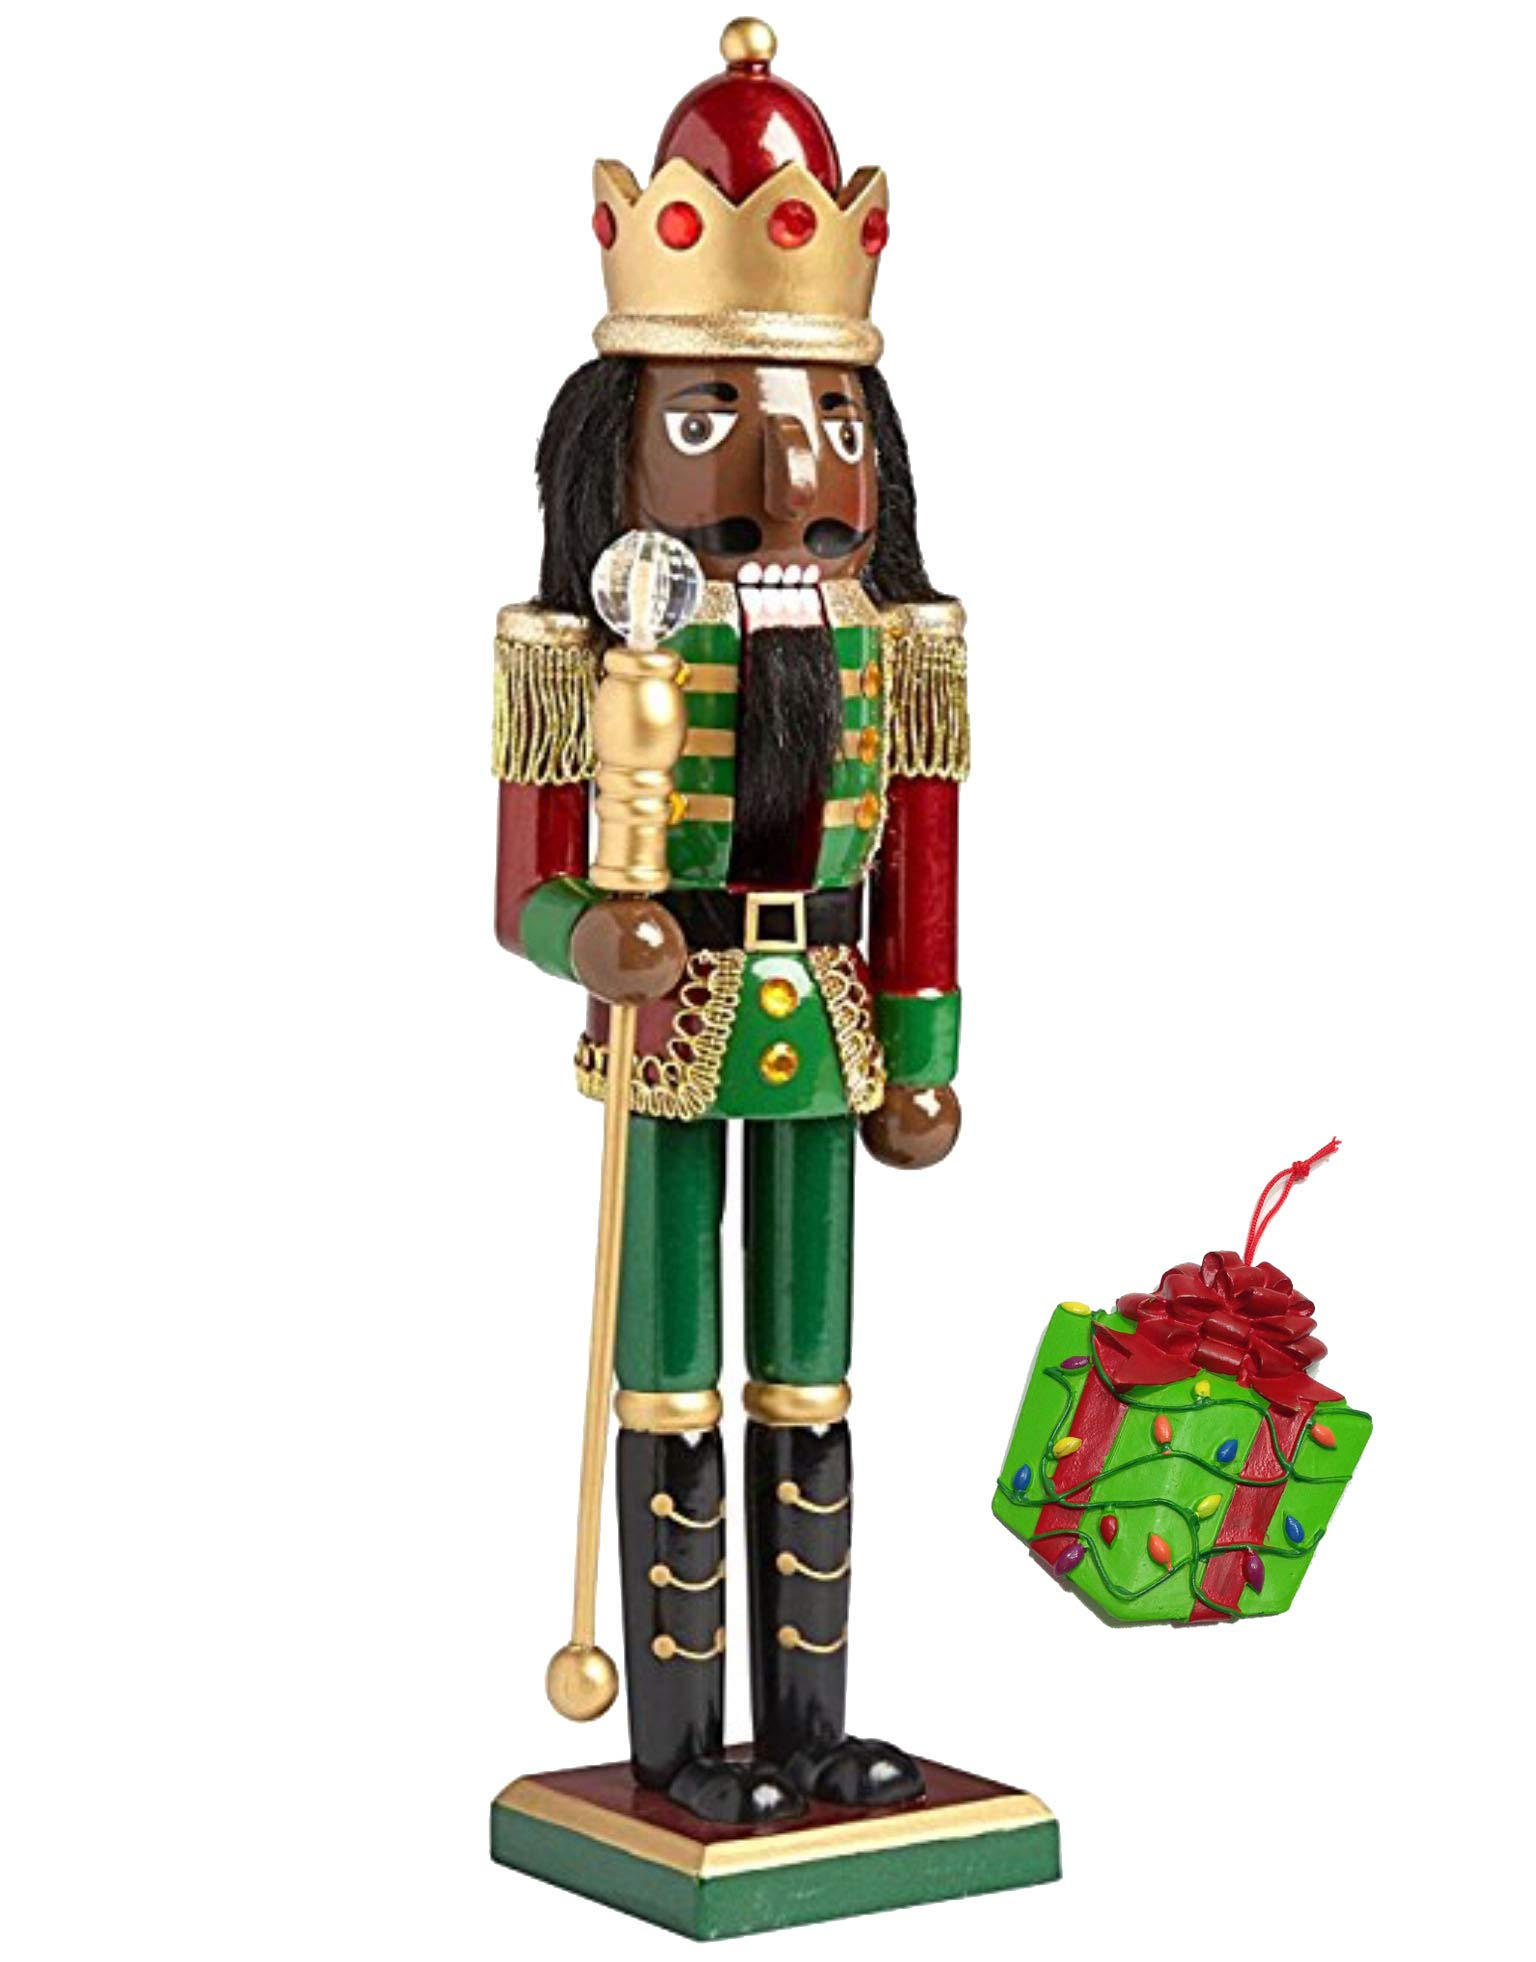 African American King Large Unique Decorative Holiday Season Wooden Christmas Nutcracker & Bonus Tree Ornament